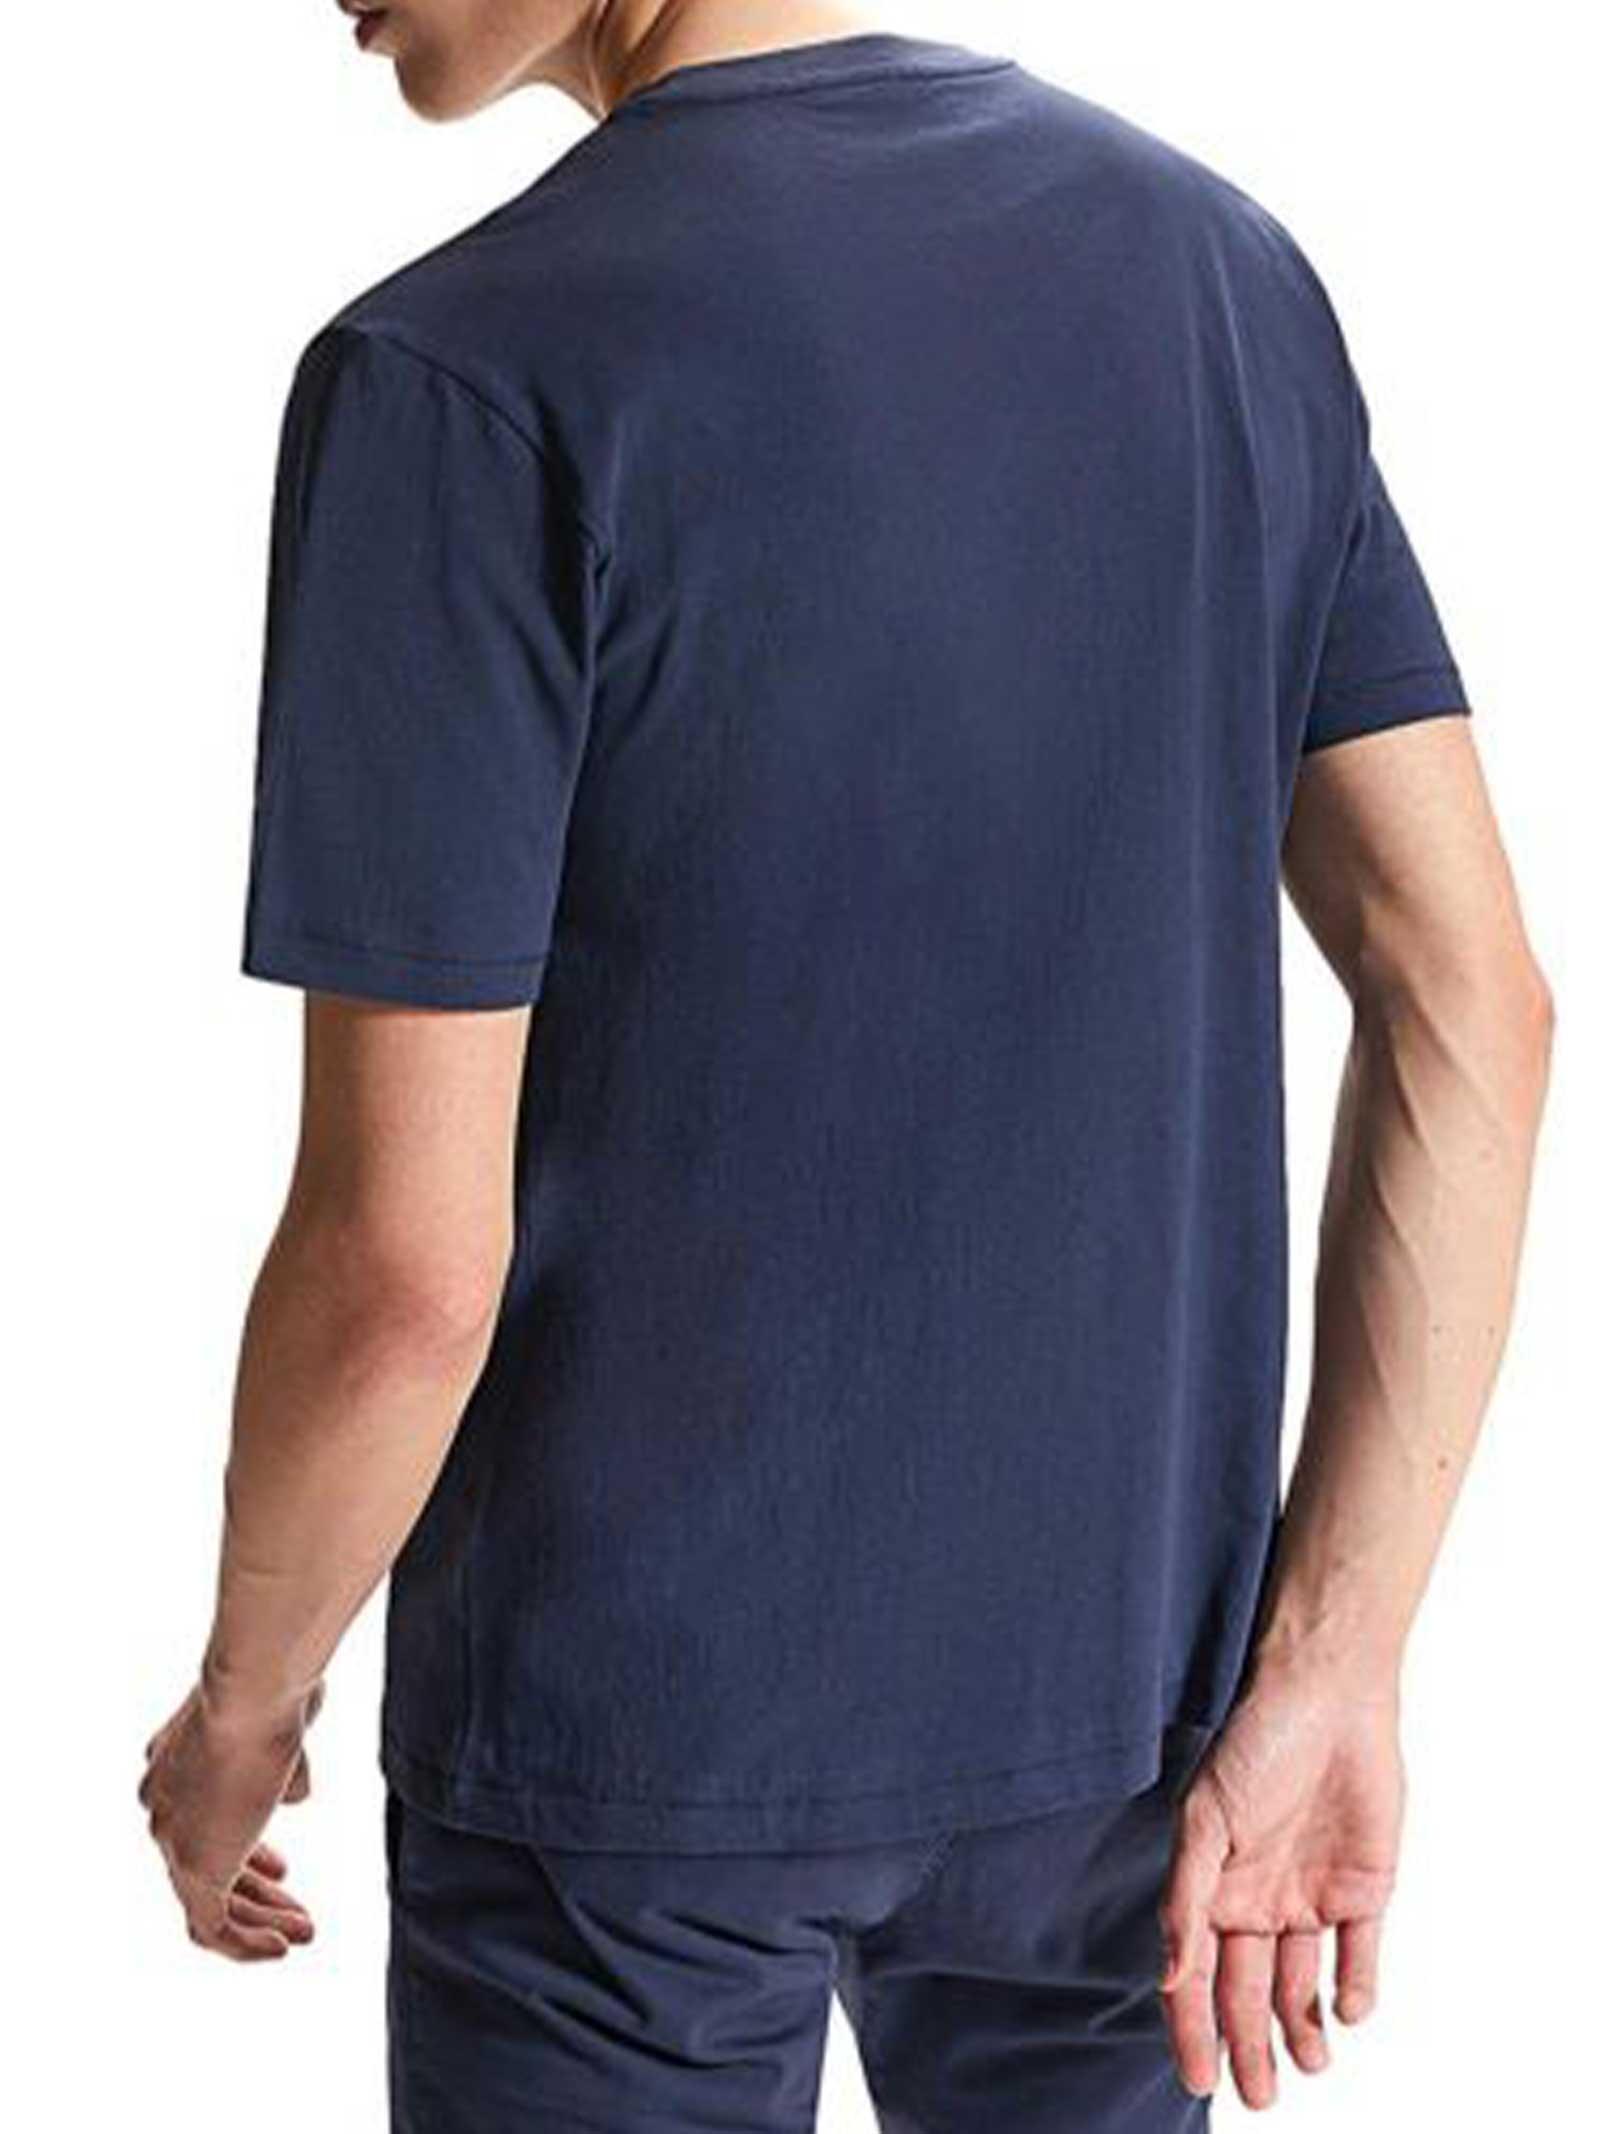 T-SHIRT UOMO NORTH SAILS | T-shirt | 6926970802